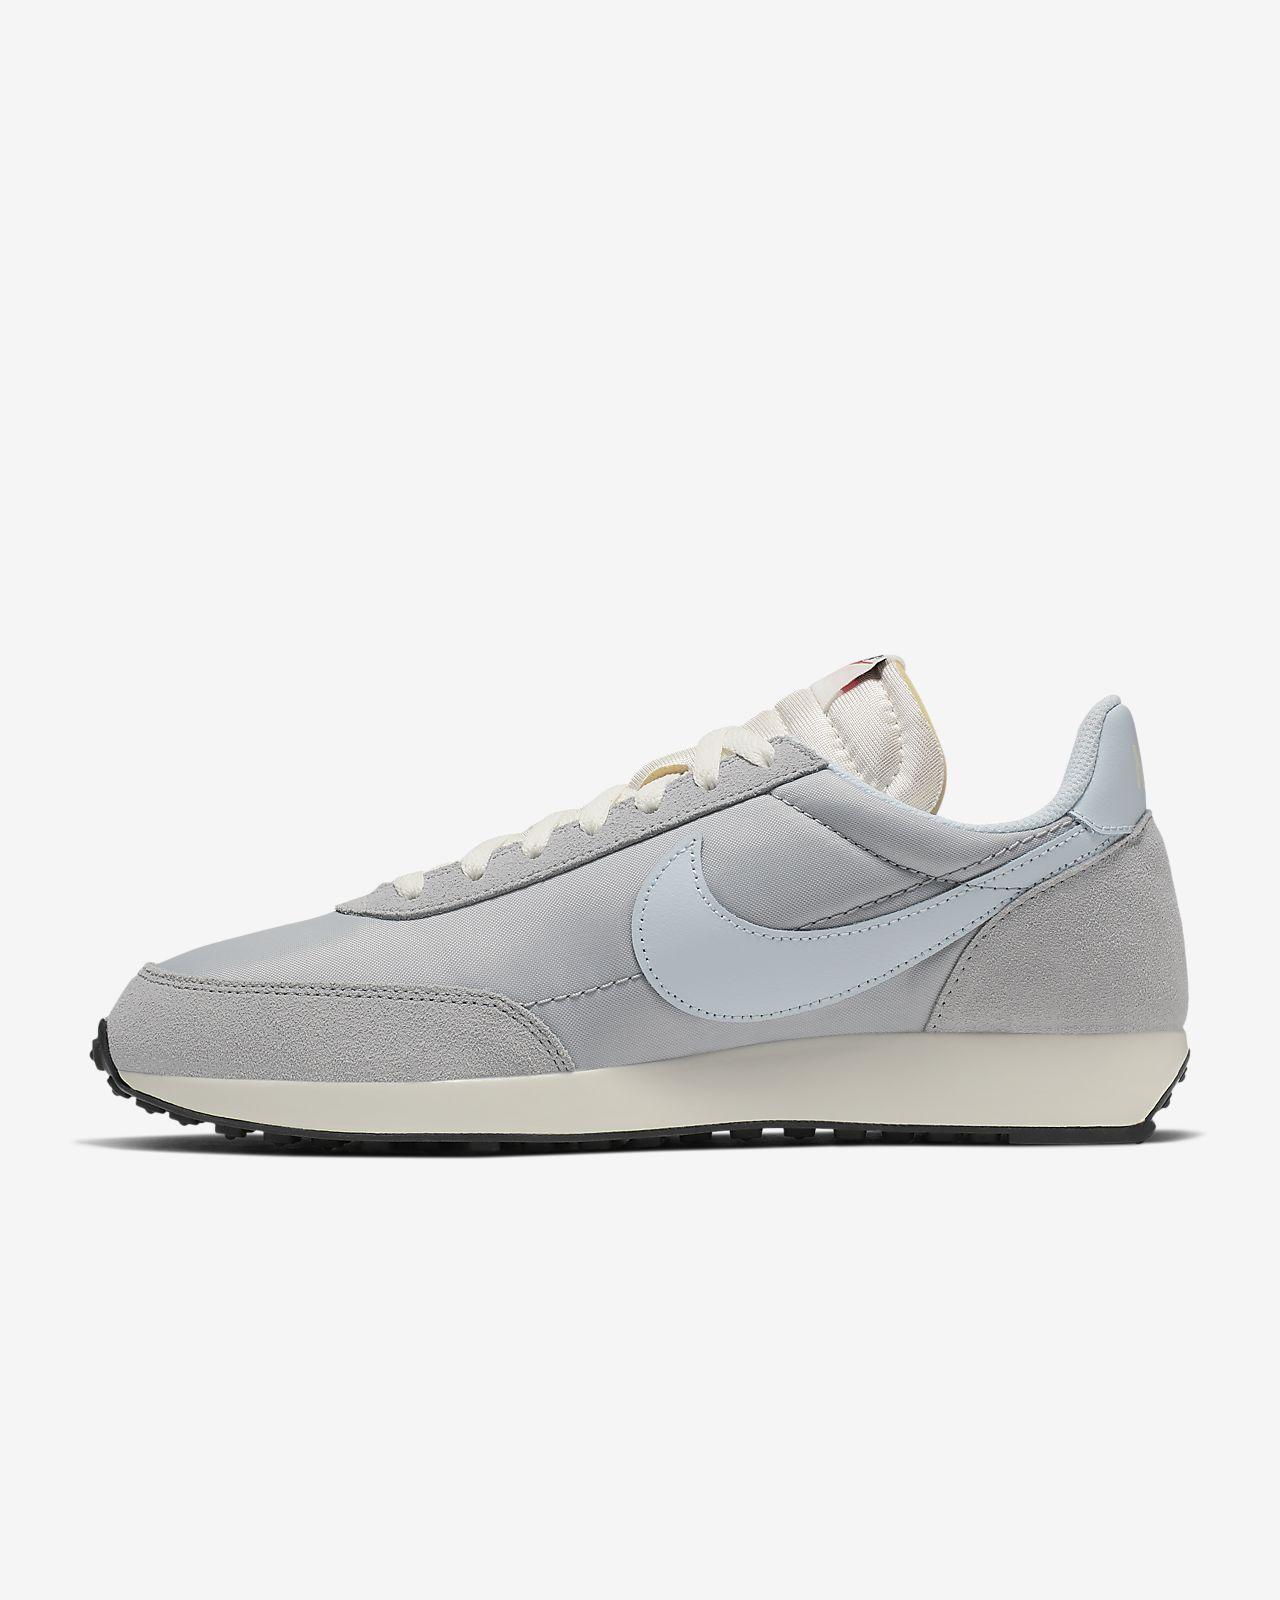 Nike Air Tailwind 79 Ayakkabı